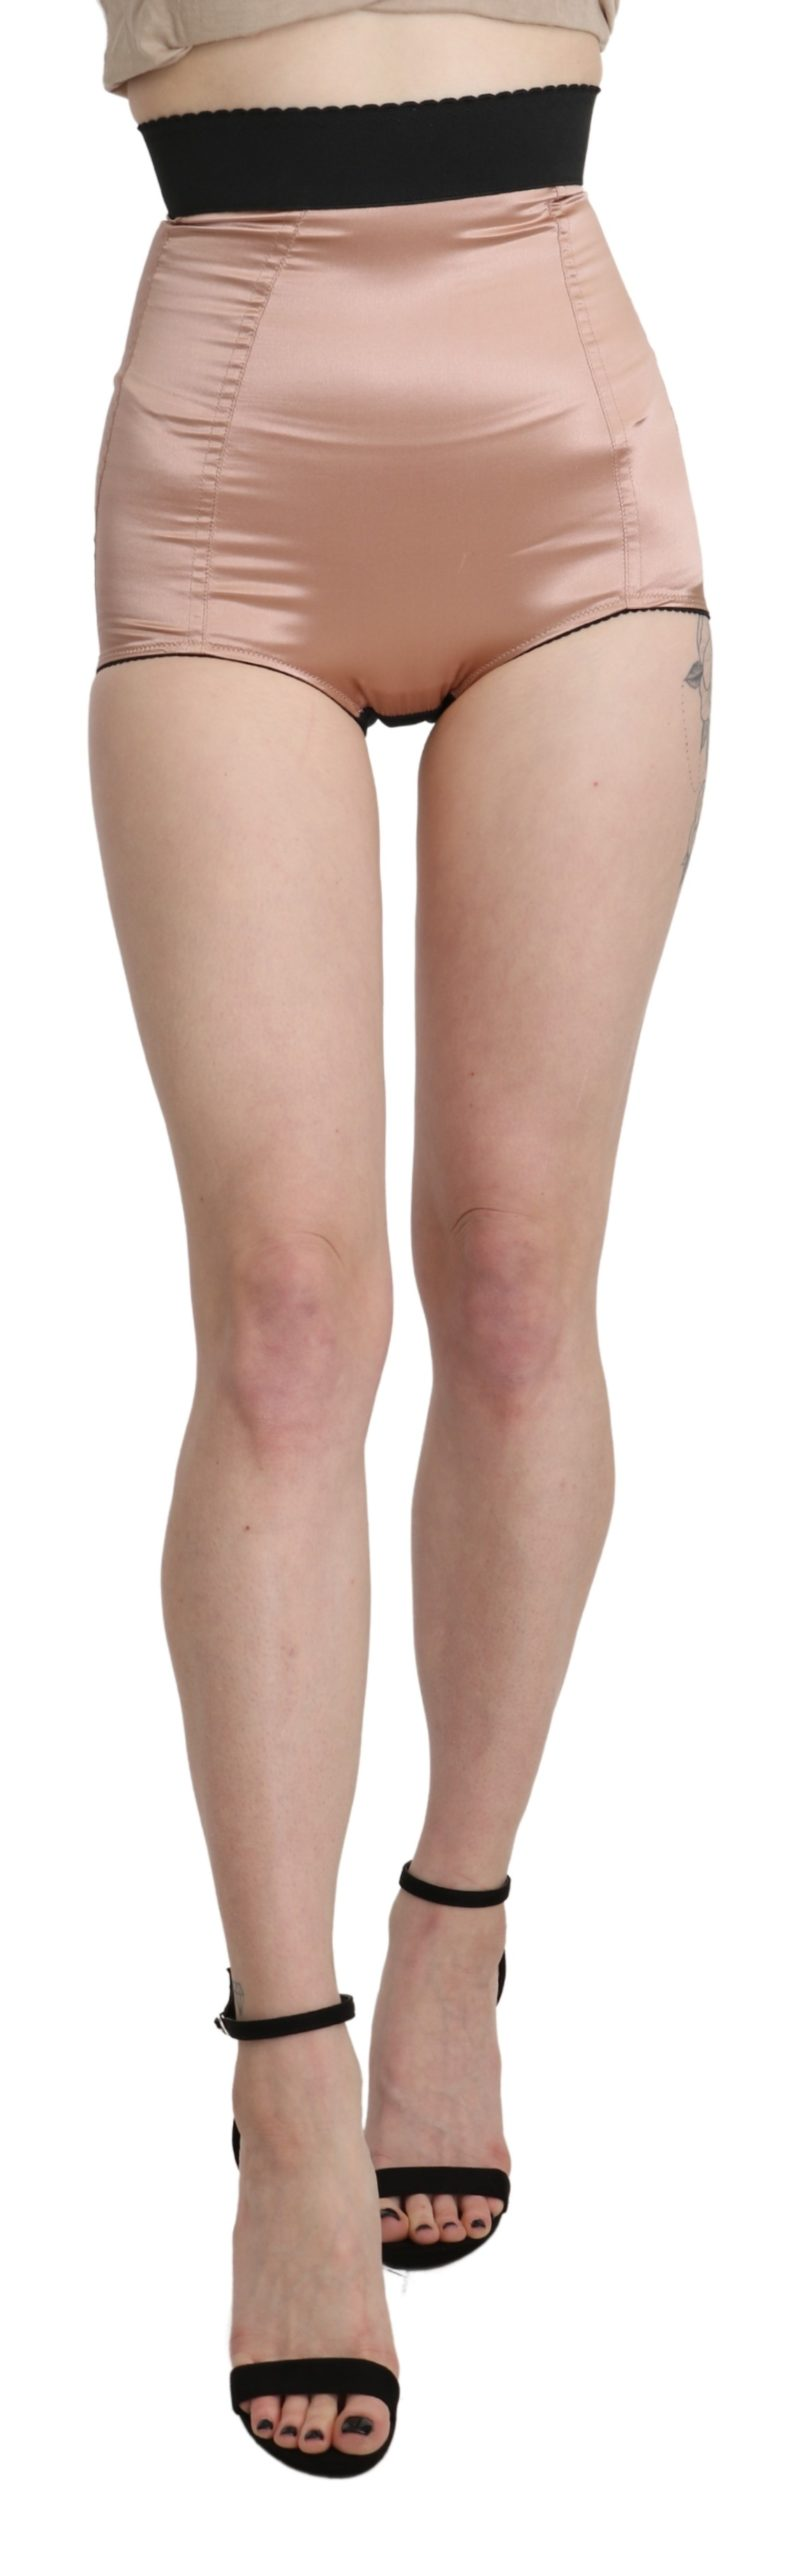 Dolce & Gabbana Women's High Waist Shorts Beige SKI1392-40 - IT40|S